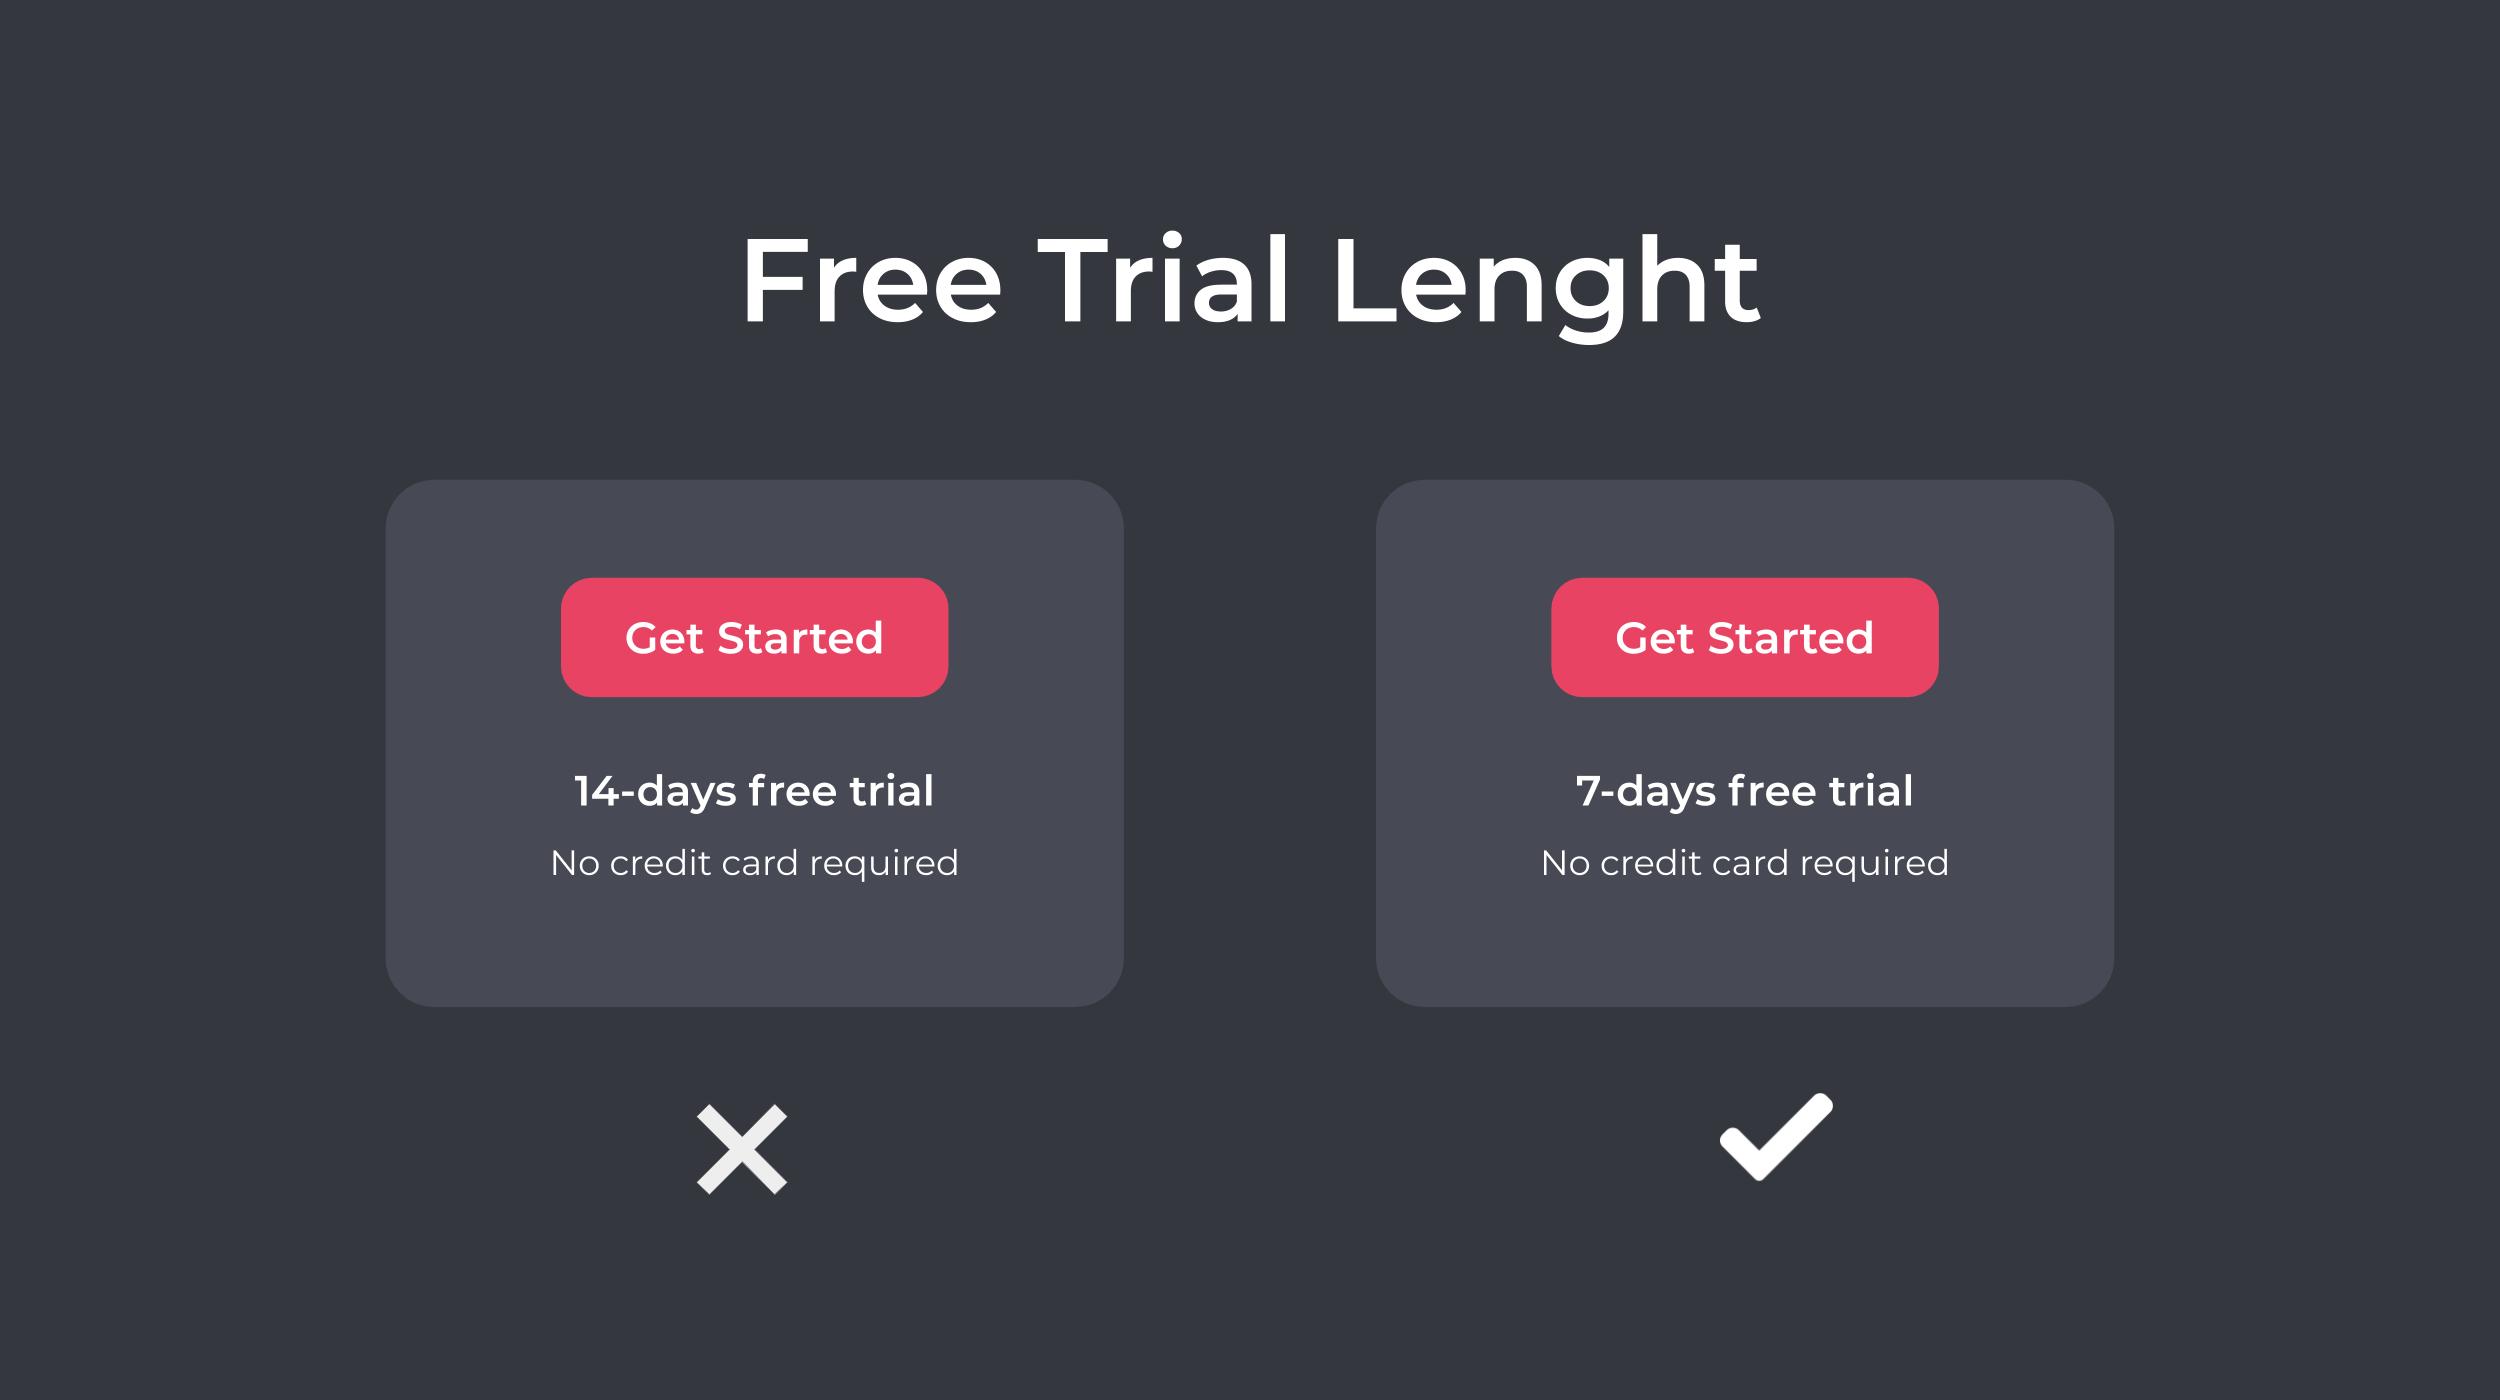 Shorten Free Trial